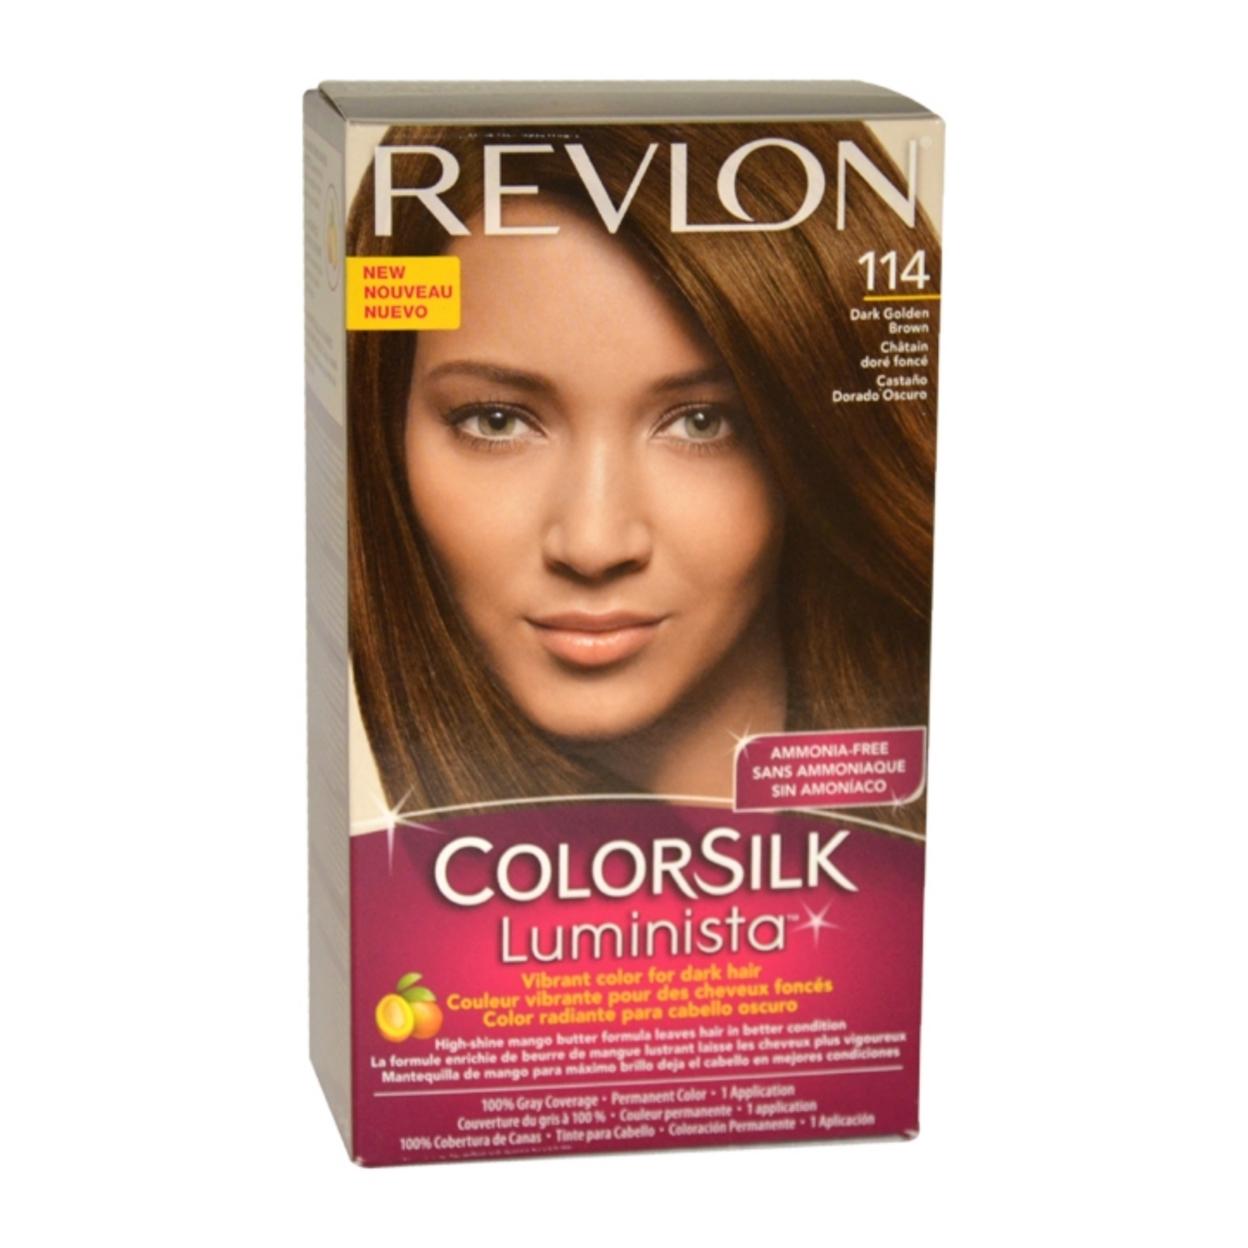 colorsilk Luminista #114 Dark Golden Brown by Revlon for Women - 1 Application Hair Color 583c6a3fe2246159f435b029